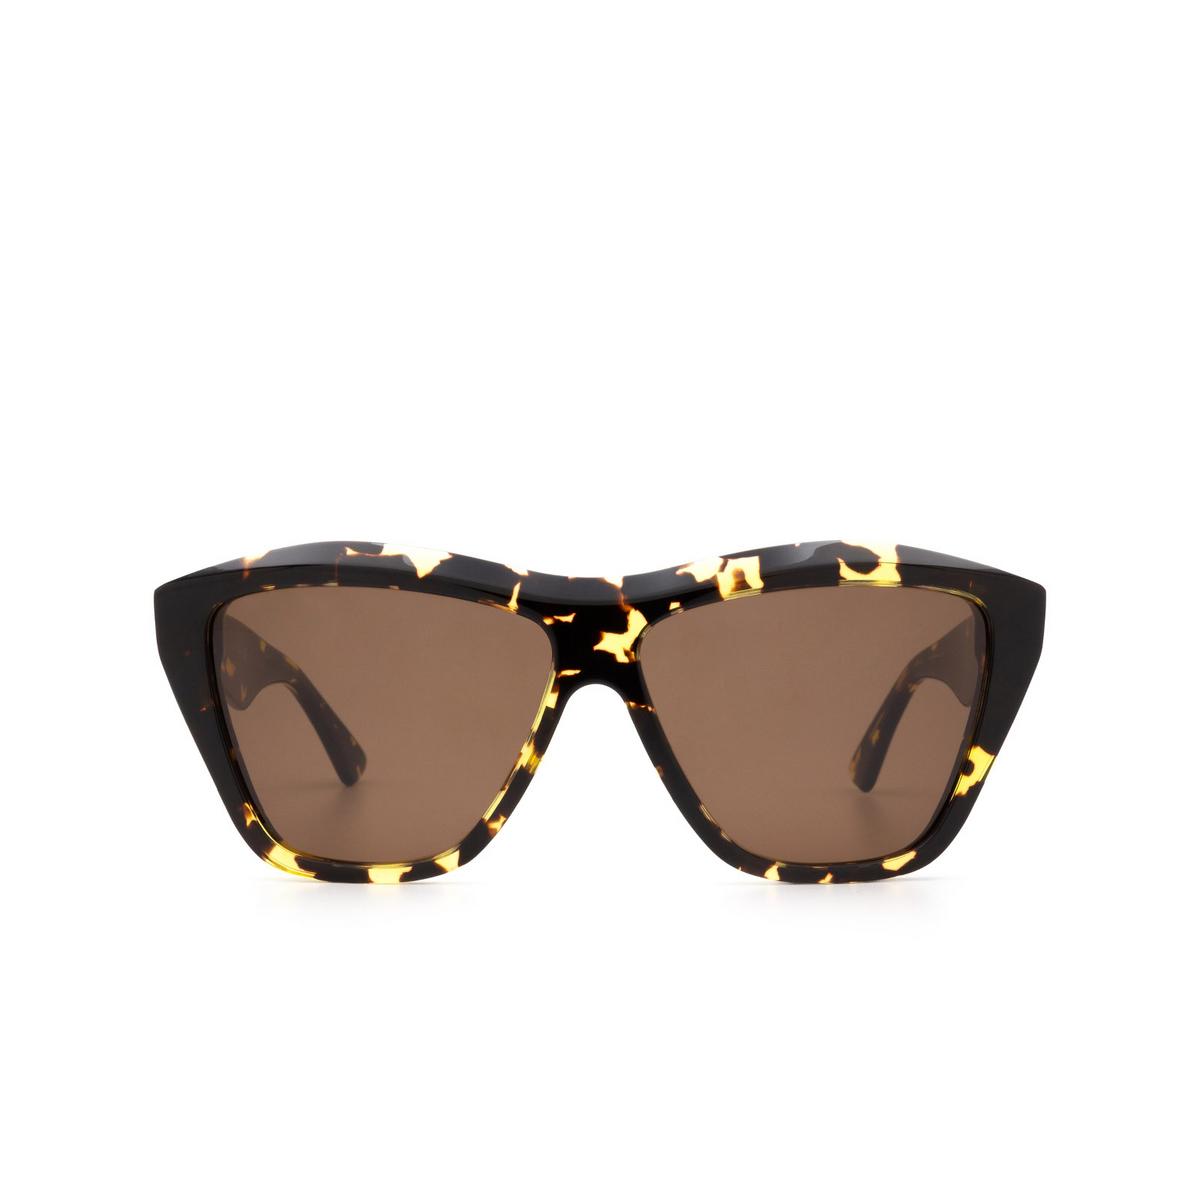 Bottega Veneta® Square Sunglasses: BV1092S color Havana 002 - front view.